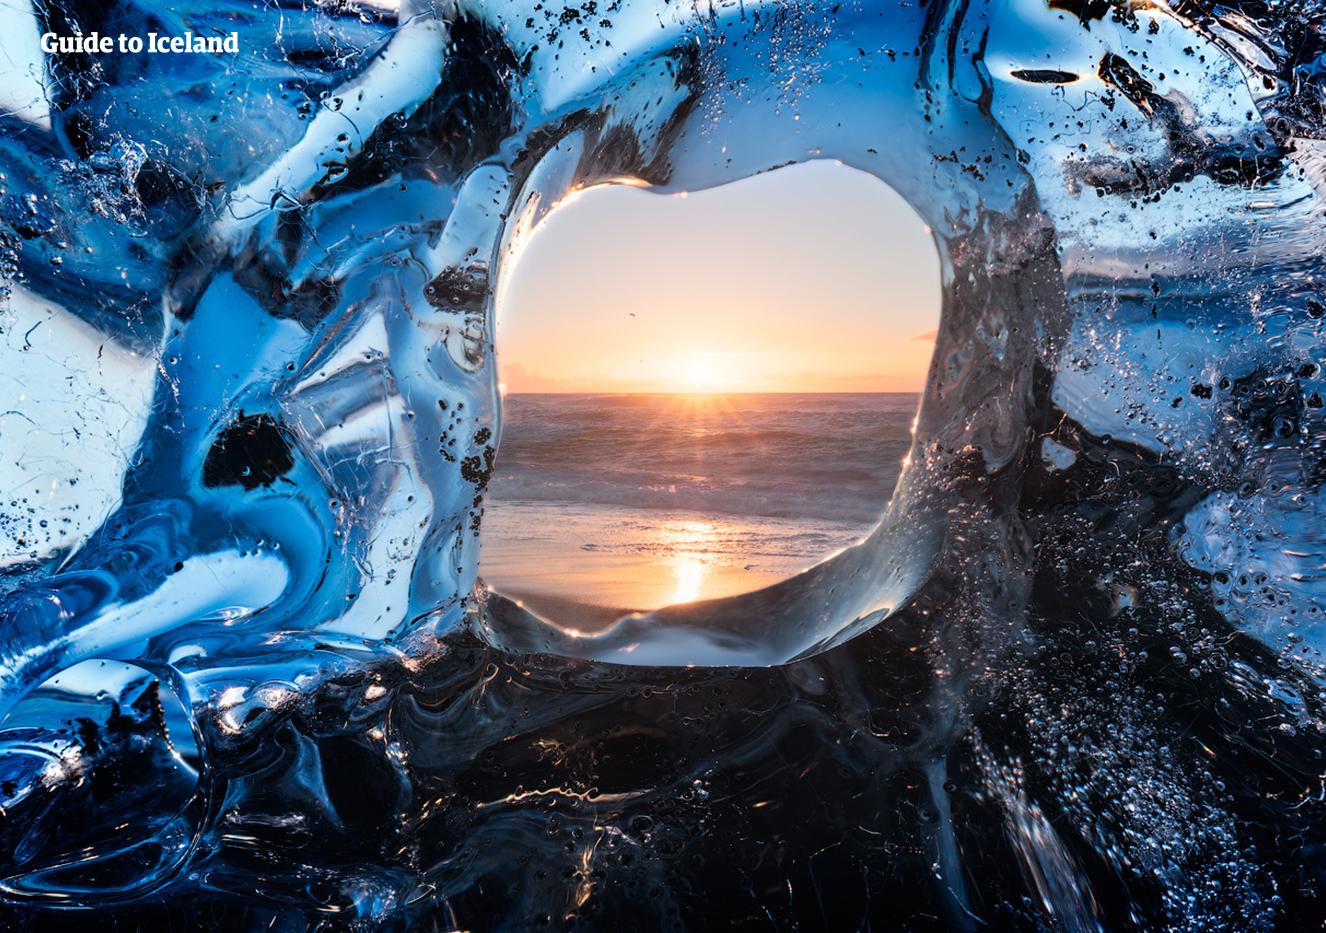 Peering through an iceberg at Diamond Beach in South Iceland.